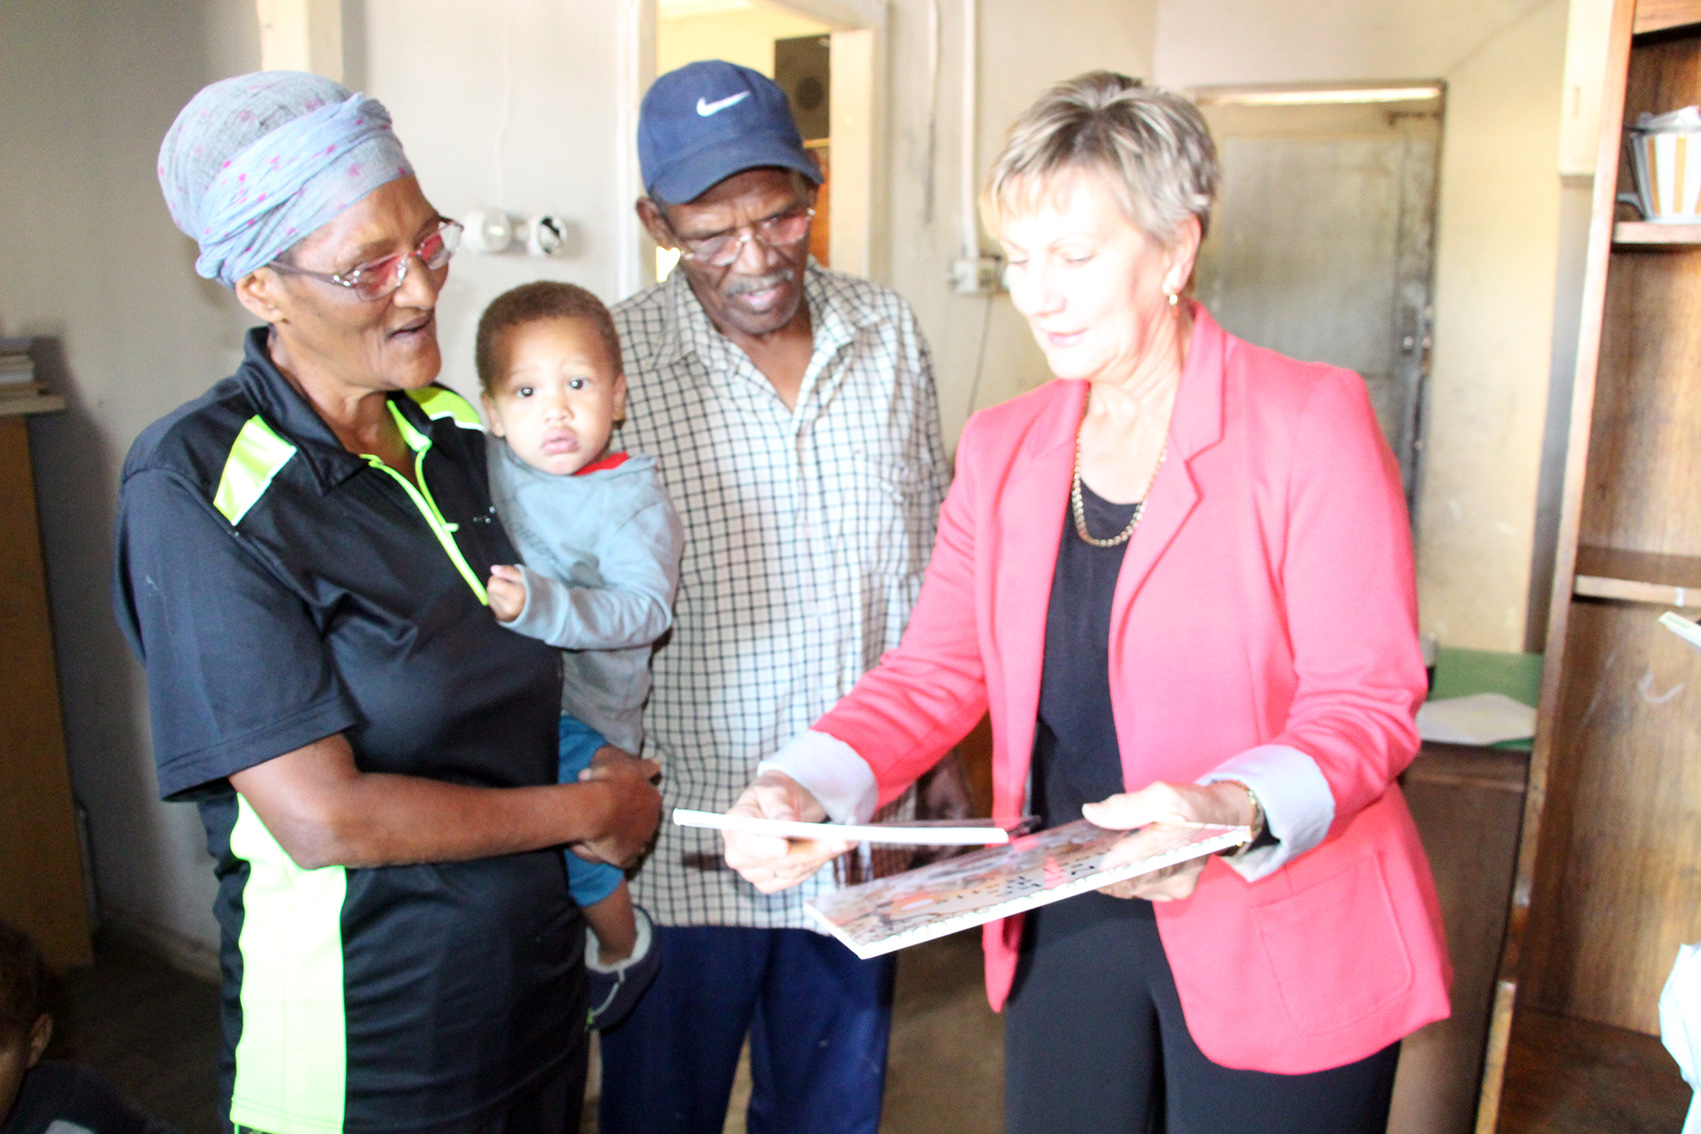 Minister Anroux Marais handing over books to the Cupido family